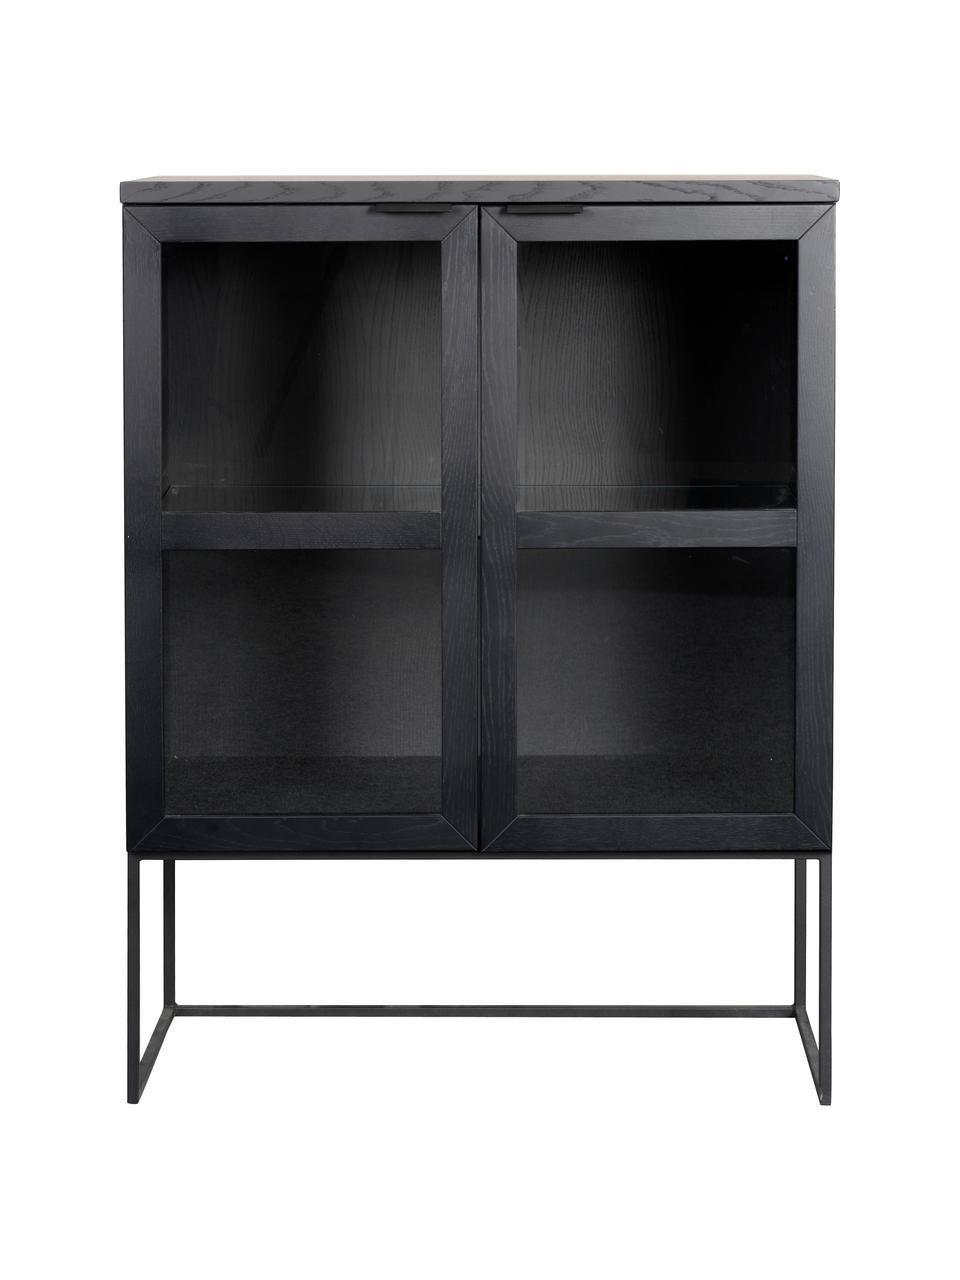 Schwarze Glasvitrine Everett mit Holzrahmen, Korpus: Eichenholz, massiv, lacki, Gestell: Metall, lackiert, Schwarz, 95 x 125 cm